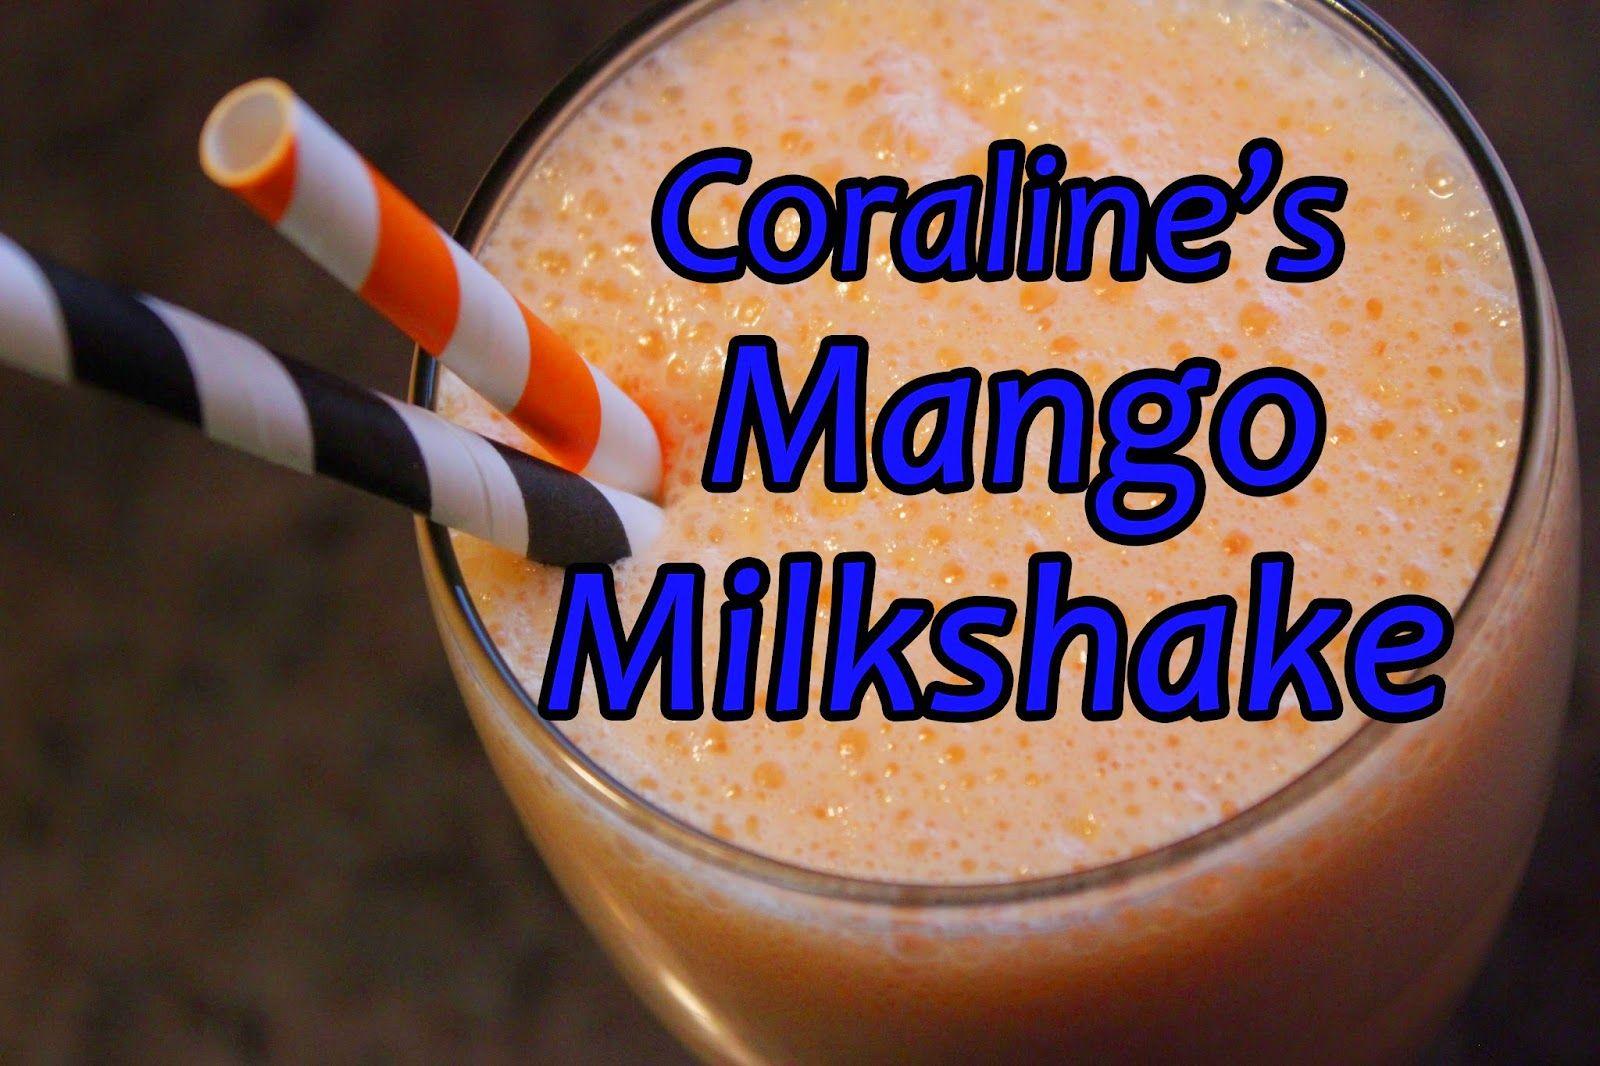 Let's Eat Fiction!: Mango Milkshake Recipe from Coraline